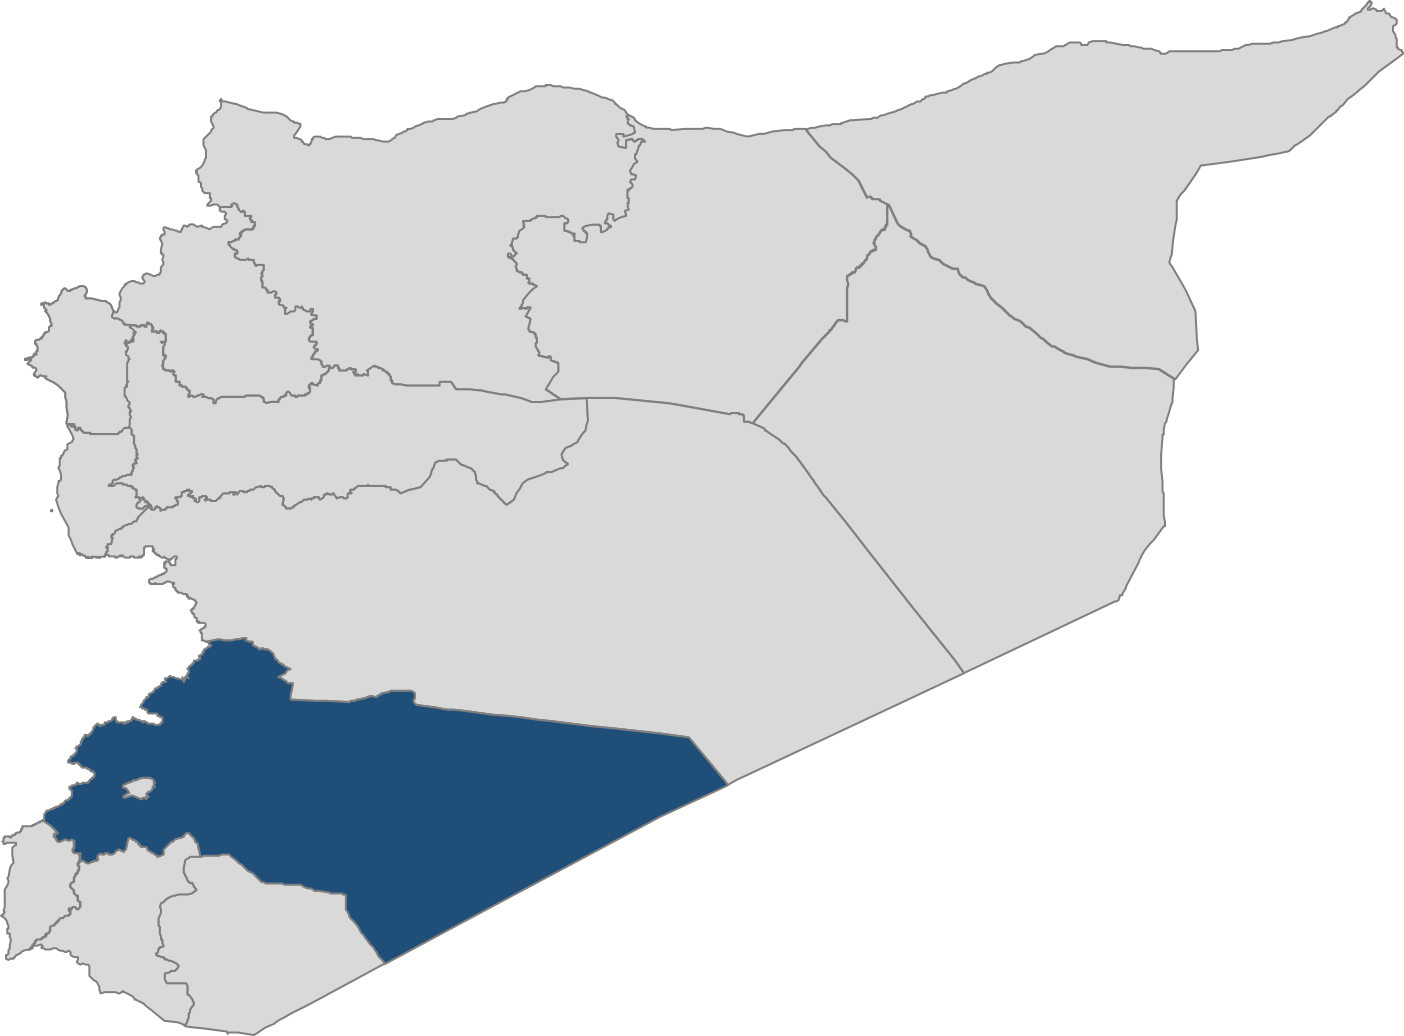 Damascus Map - Syrian American Medical Society Foundation on libya map, umayyad mosque, medina map, sanaa map, amman map, constantinople map, asma al-assad, belgrade map, bashar al-assad, jordan map, aleppo map, ankara map, sinai peninsula map, syria map, euphrates river map, canaan map, muscat map, tyre map, beirut on a map, mecca map, jerusalem map, iraq map, persia map,